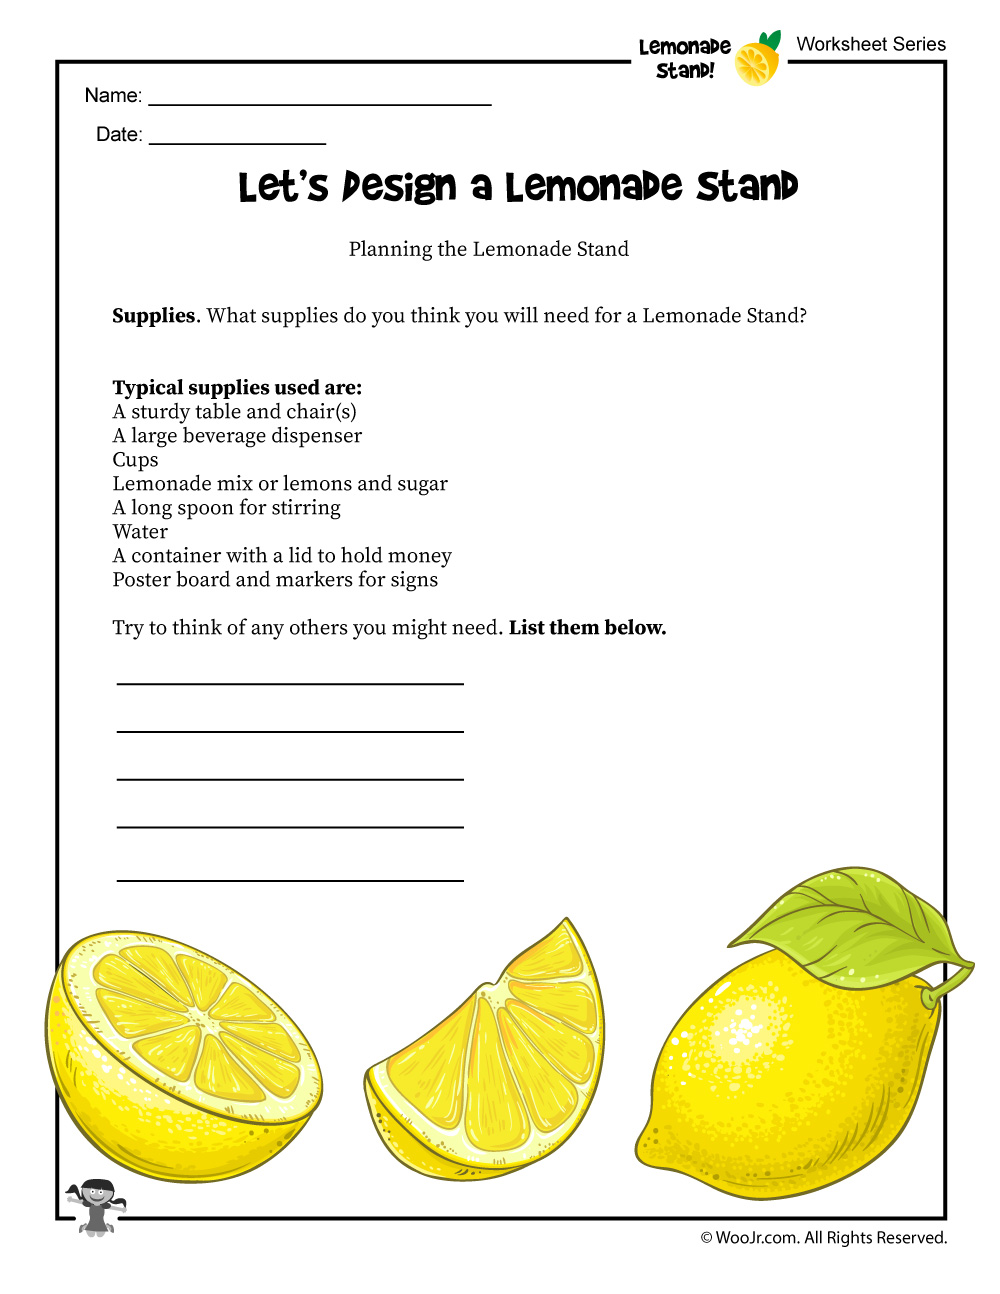 image relating to Lemonade Signs Printable known as Lemonade Stand Creating Worksheet Woo! Jr. Children Things to do